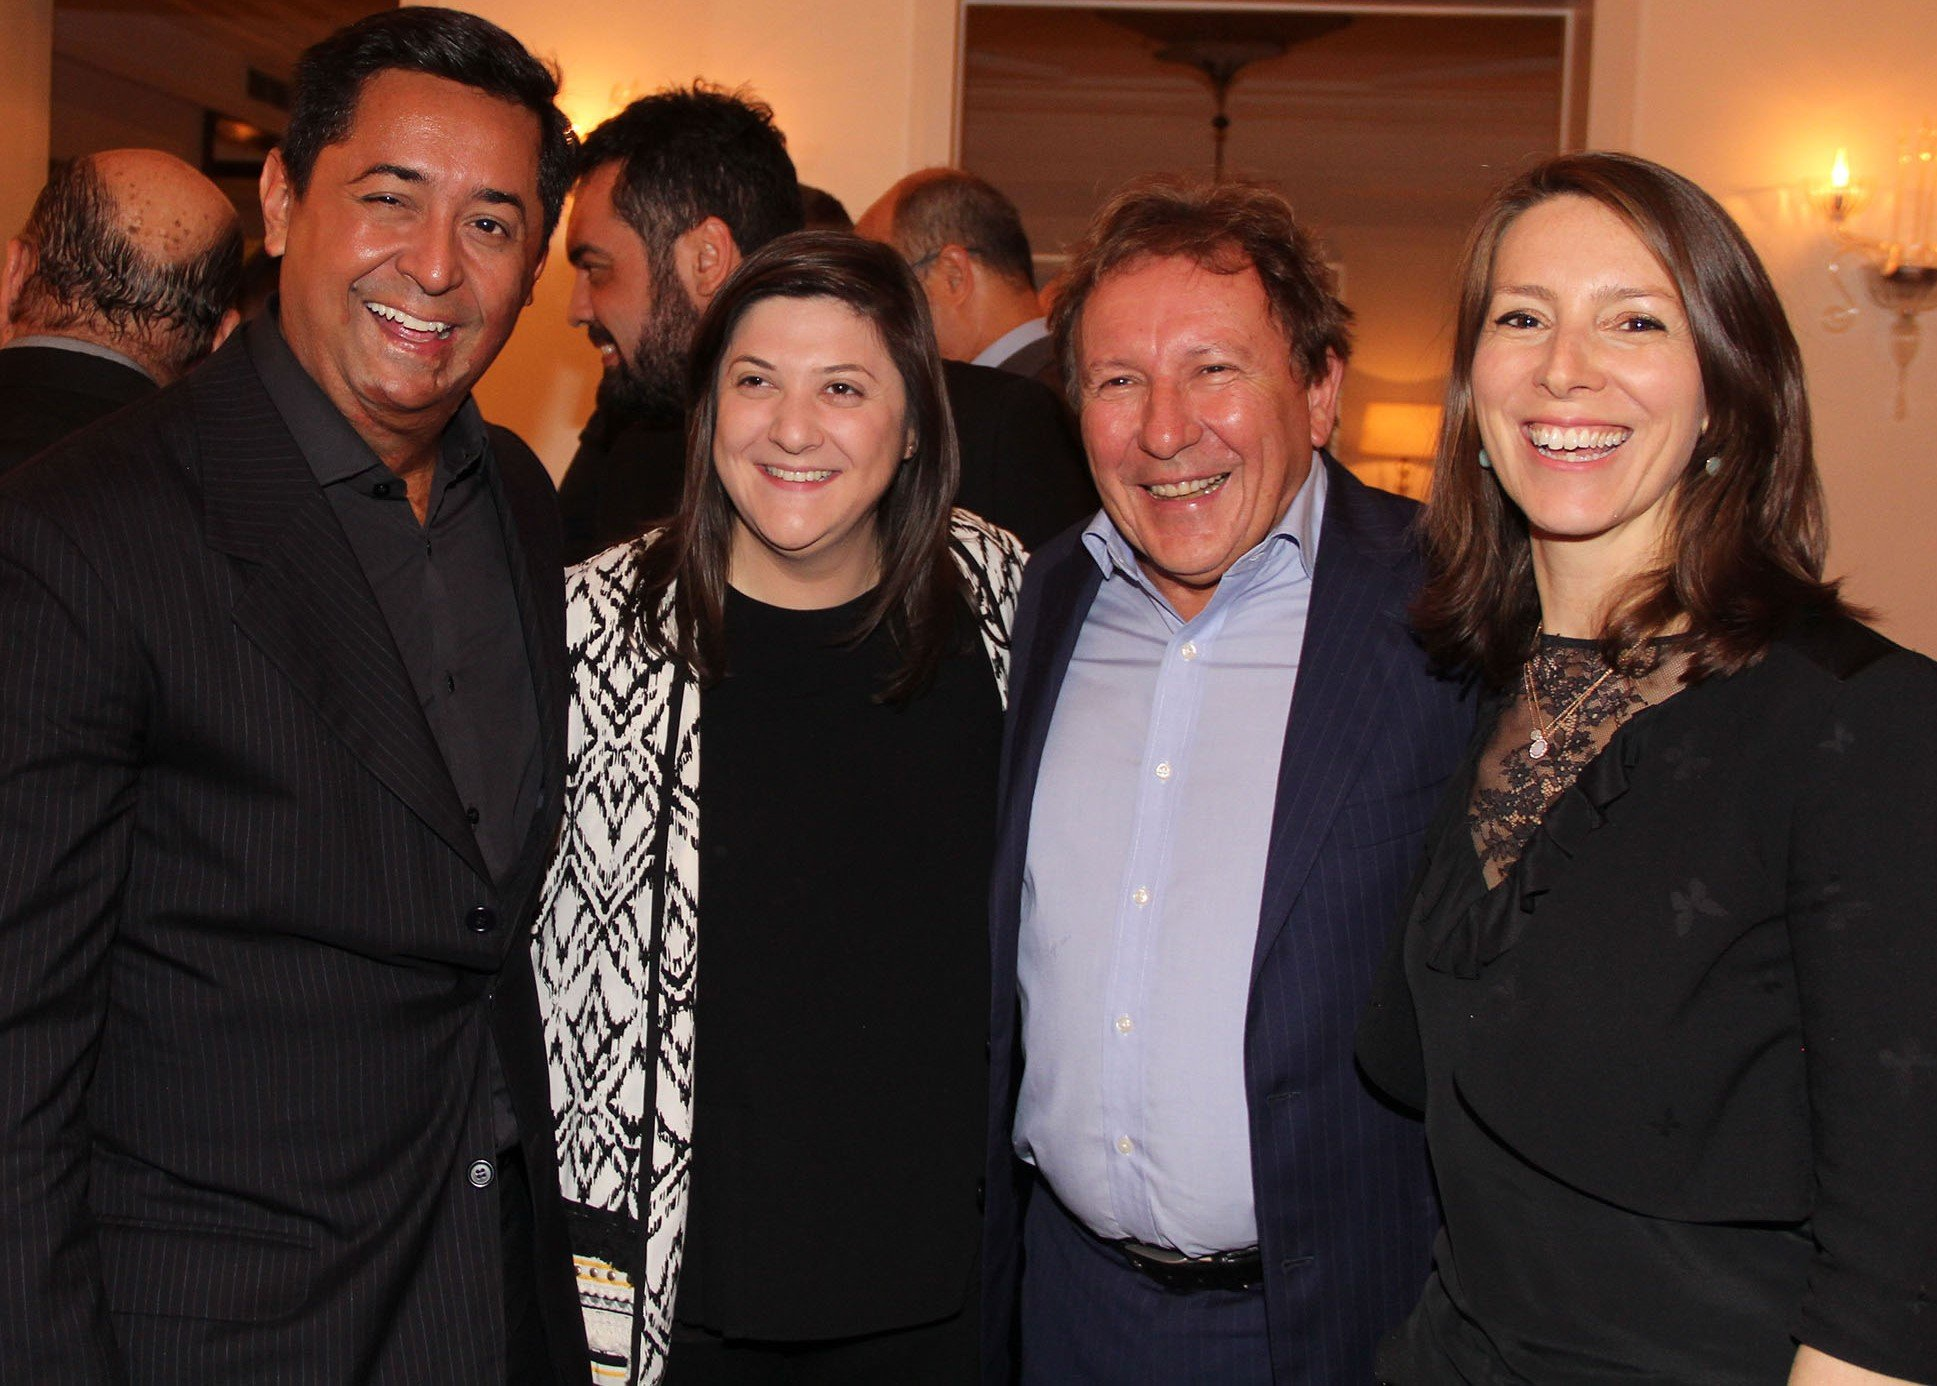 JR Pereira, Emily Prazer, Aristides Corbellini e Chloe Target Adams  /Foto: Paulo de Deus